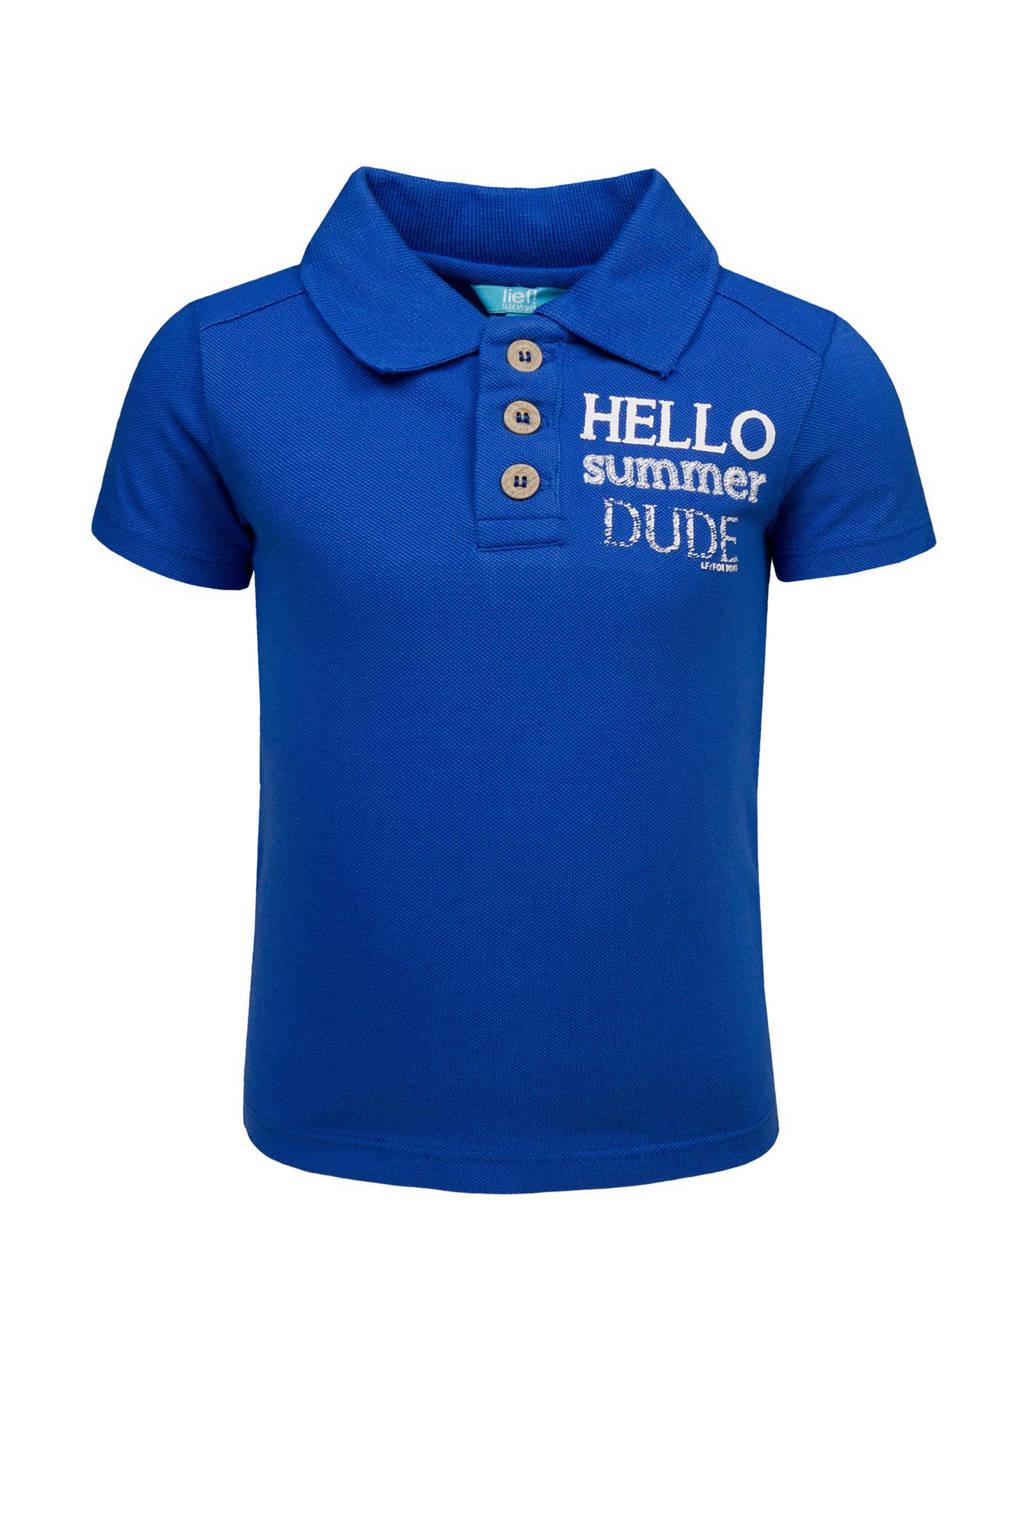 lief! polo met tekst blauw, Kobaltblauw